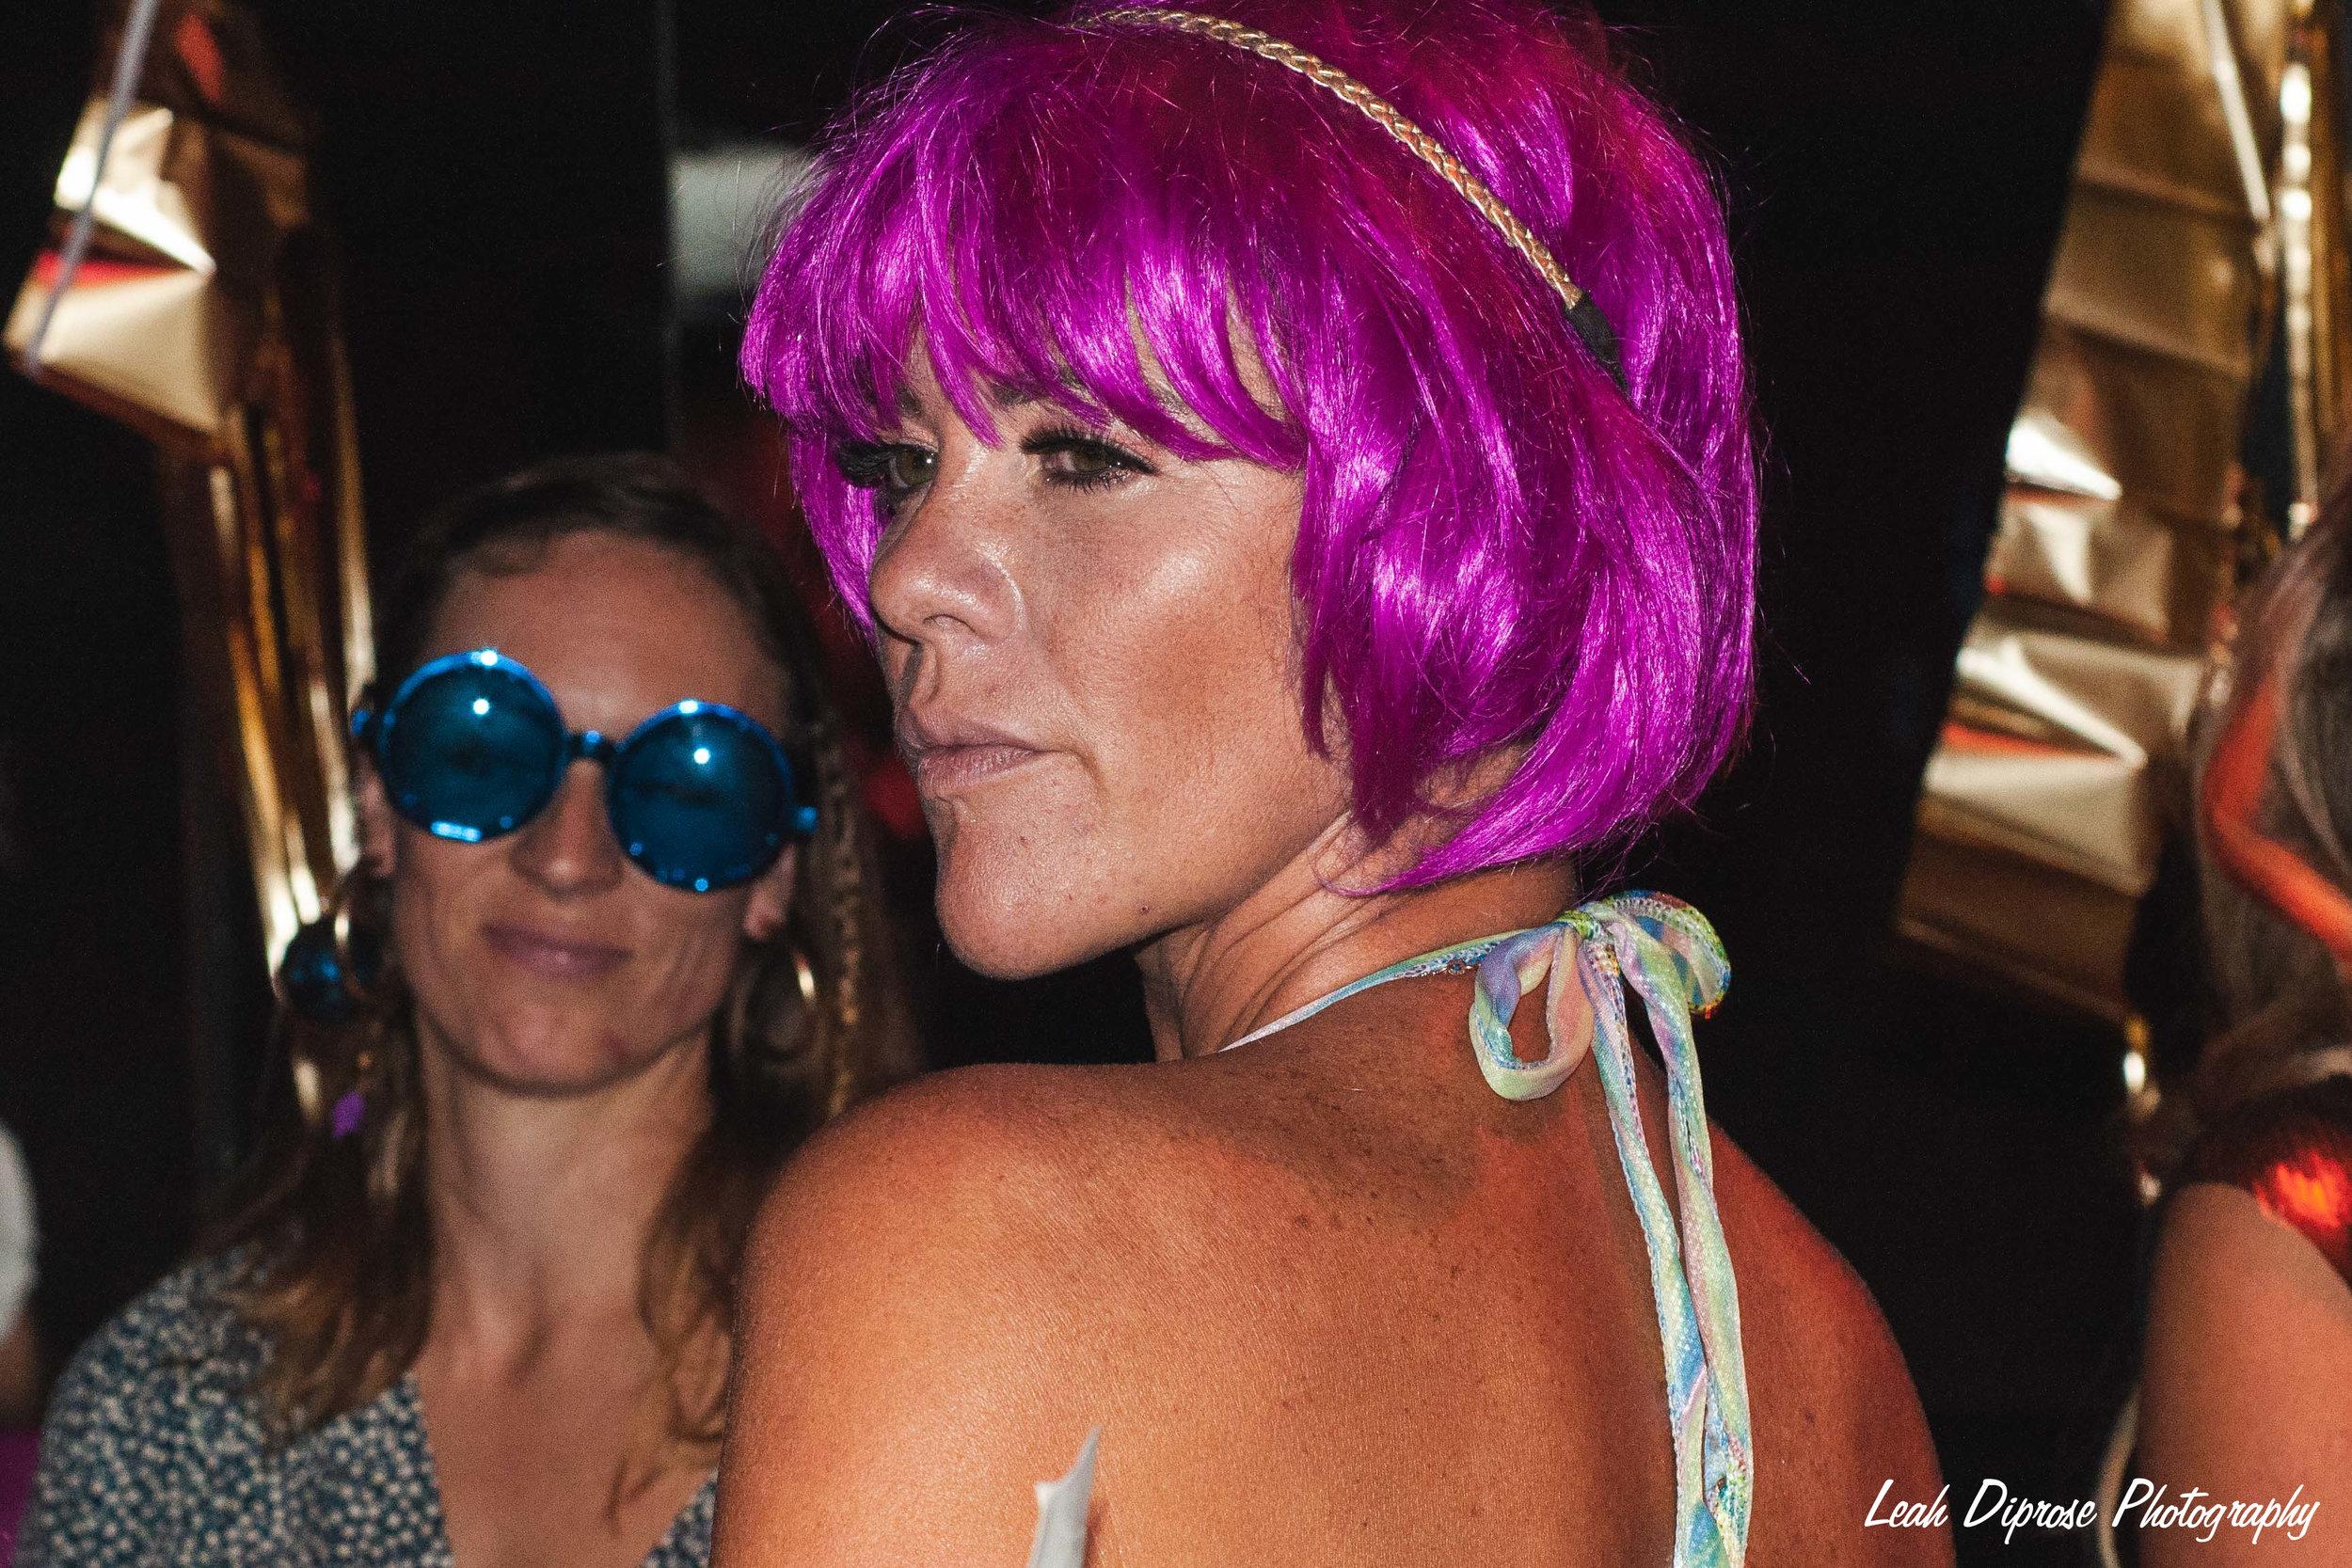 Leah Diprose Photography image-0356.jpg